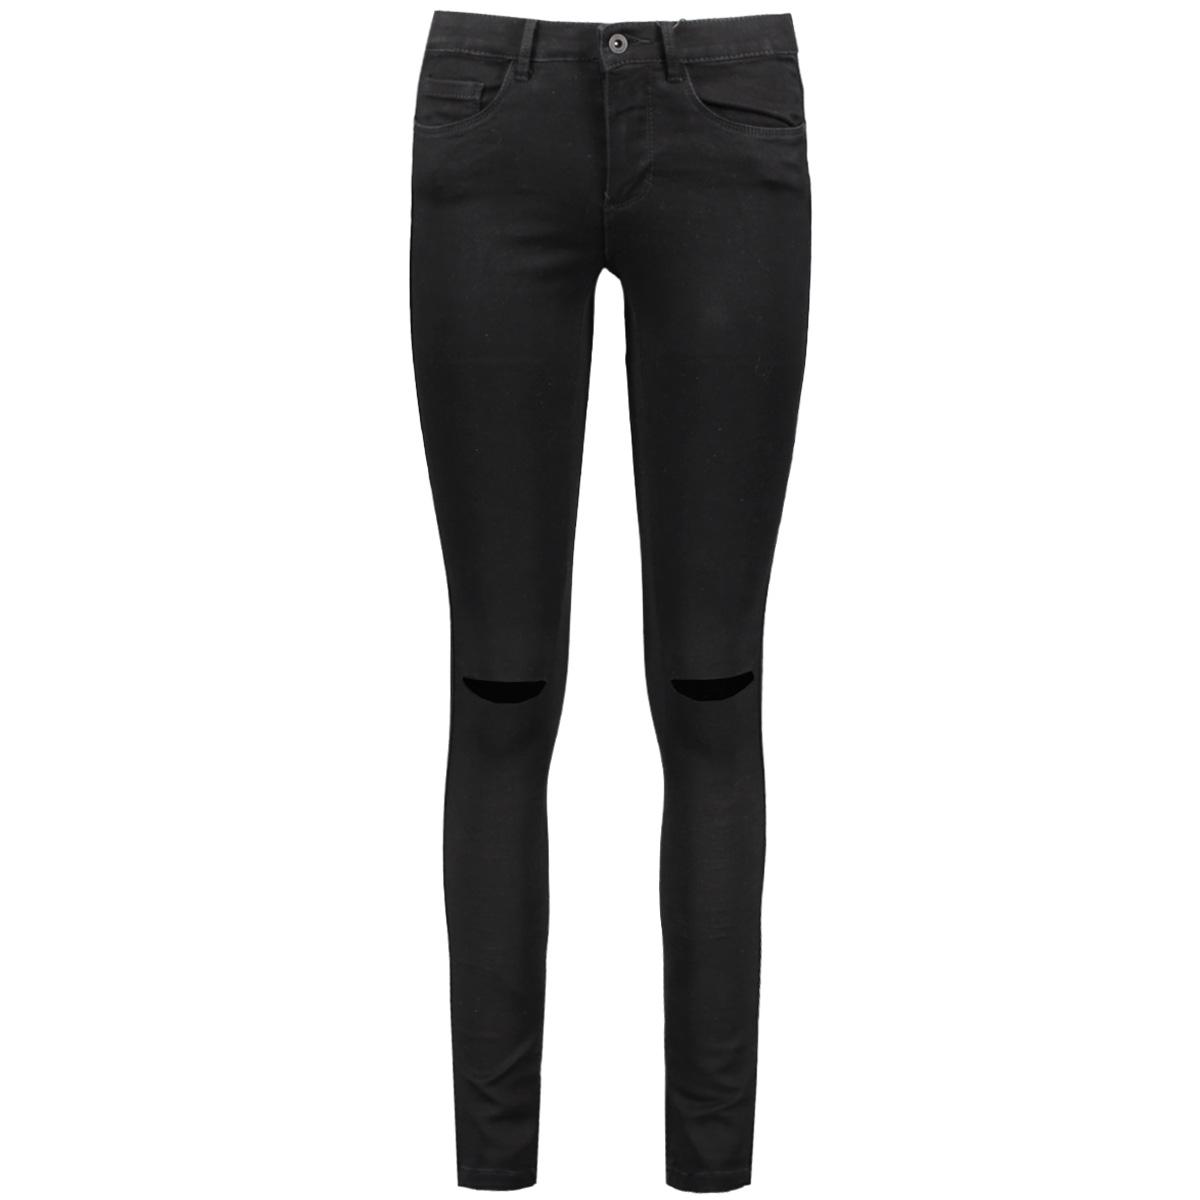 onlroyal reg sk kneecut jeans 15097973 only jeans black